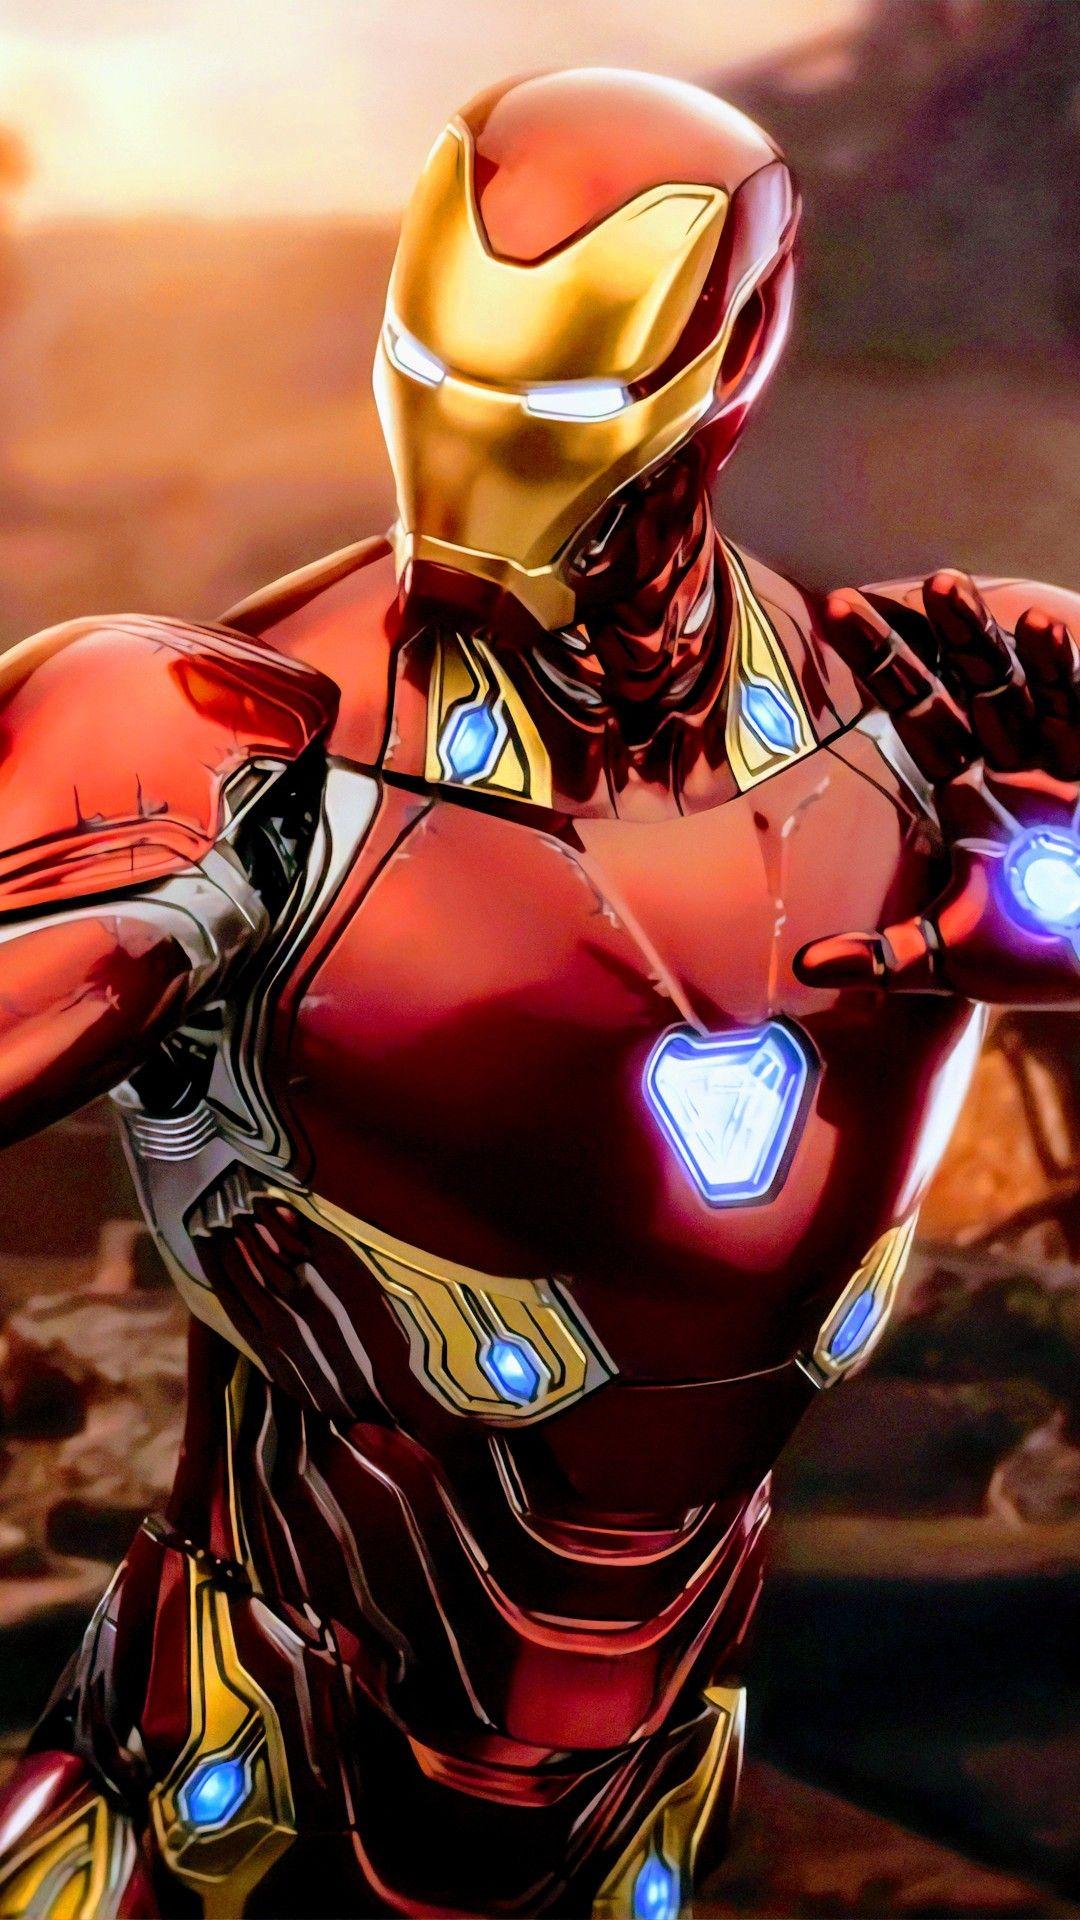 Iron Man Tony Stark Iron Man Pictures Iron Man Art Iron Man Avengers